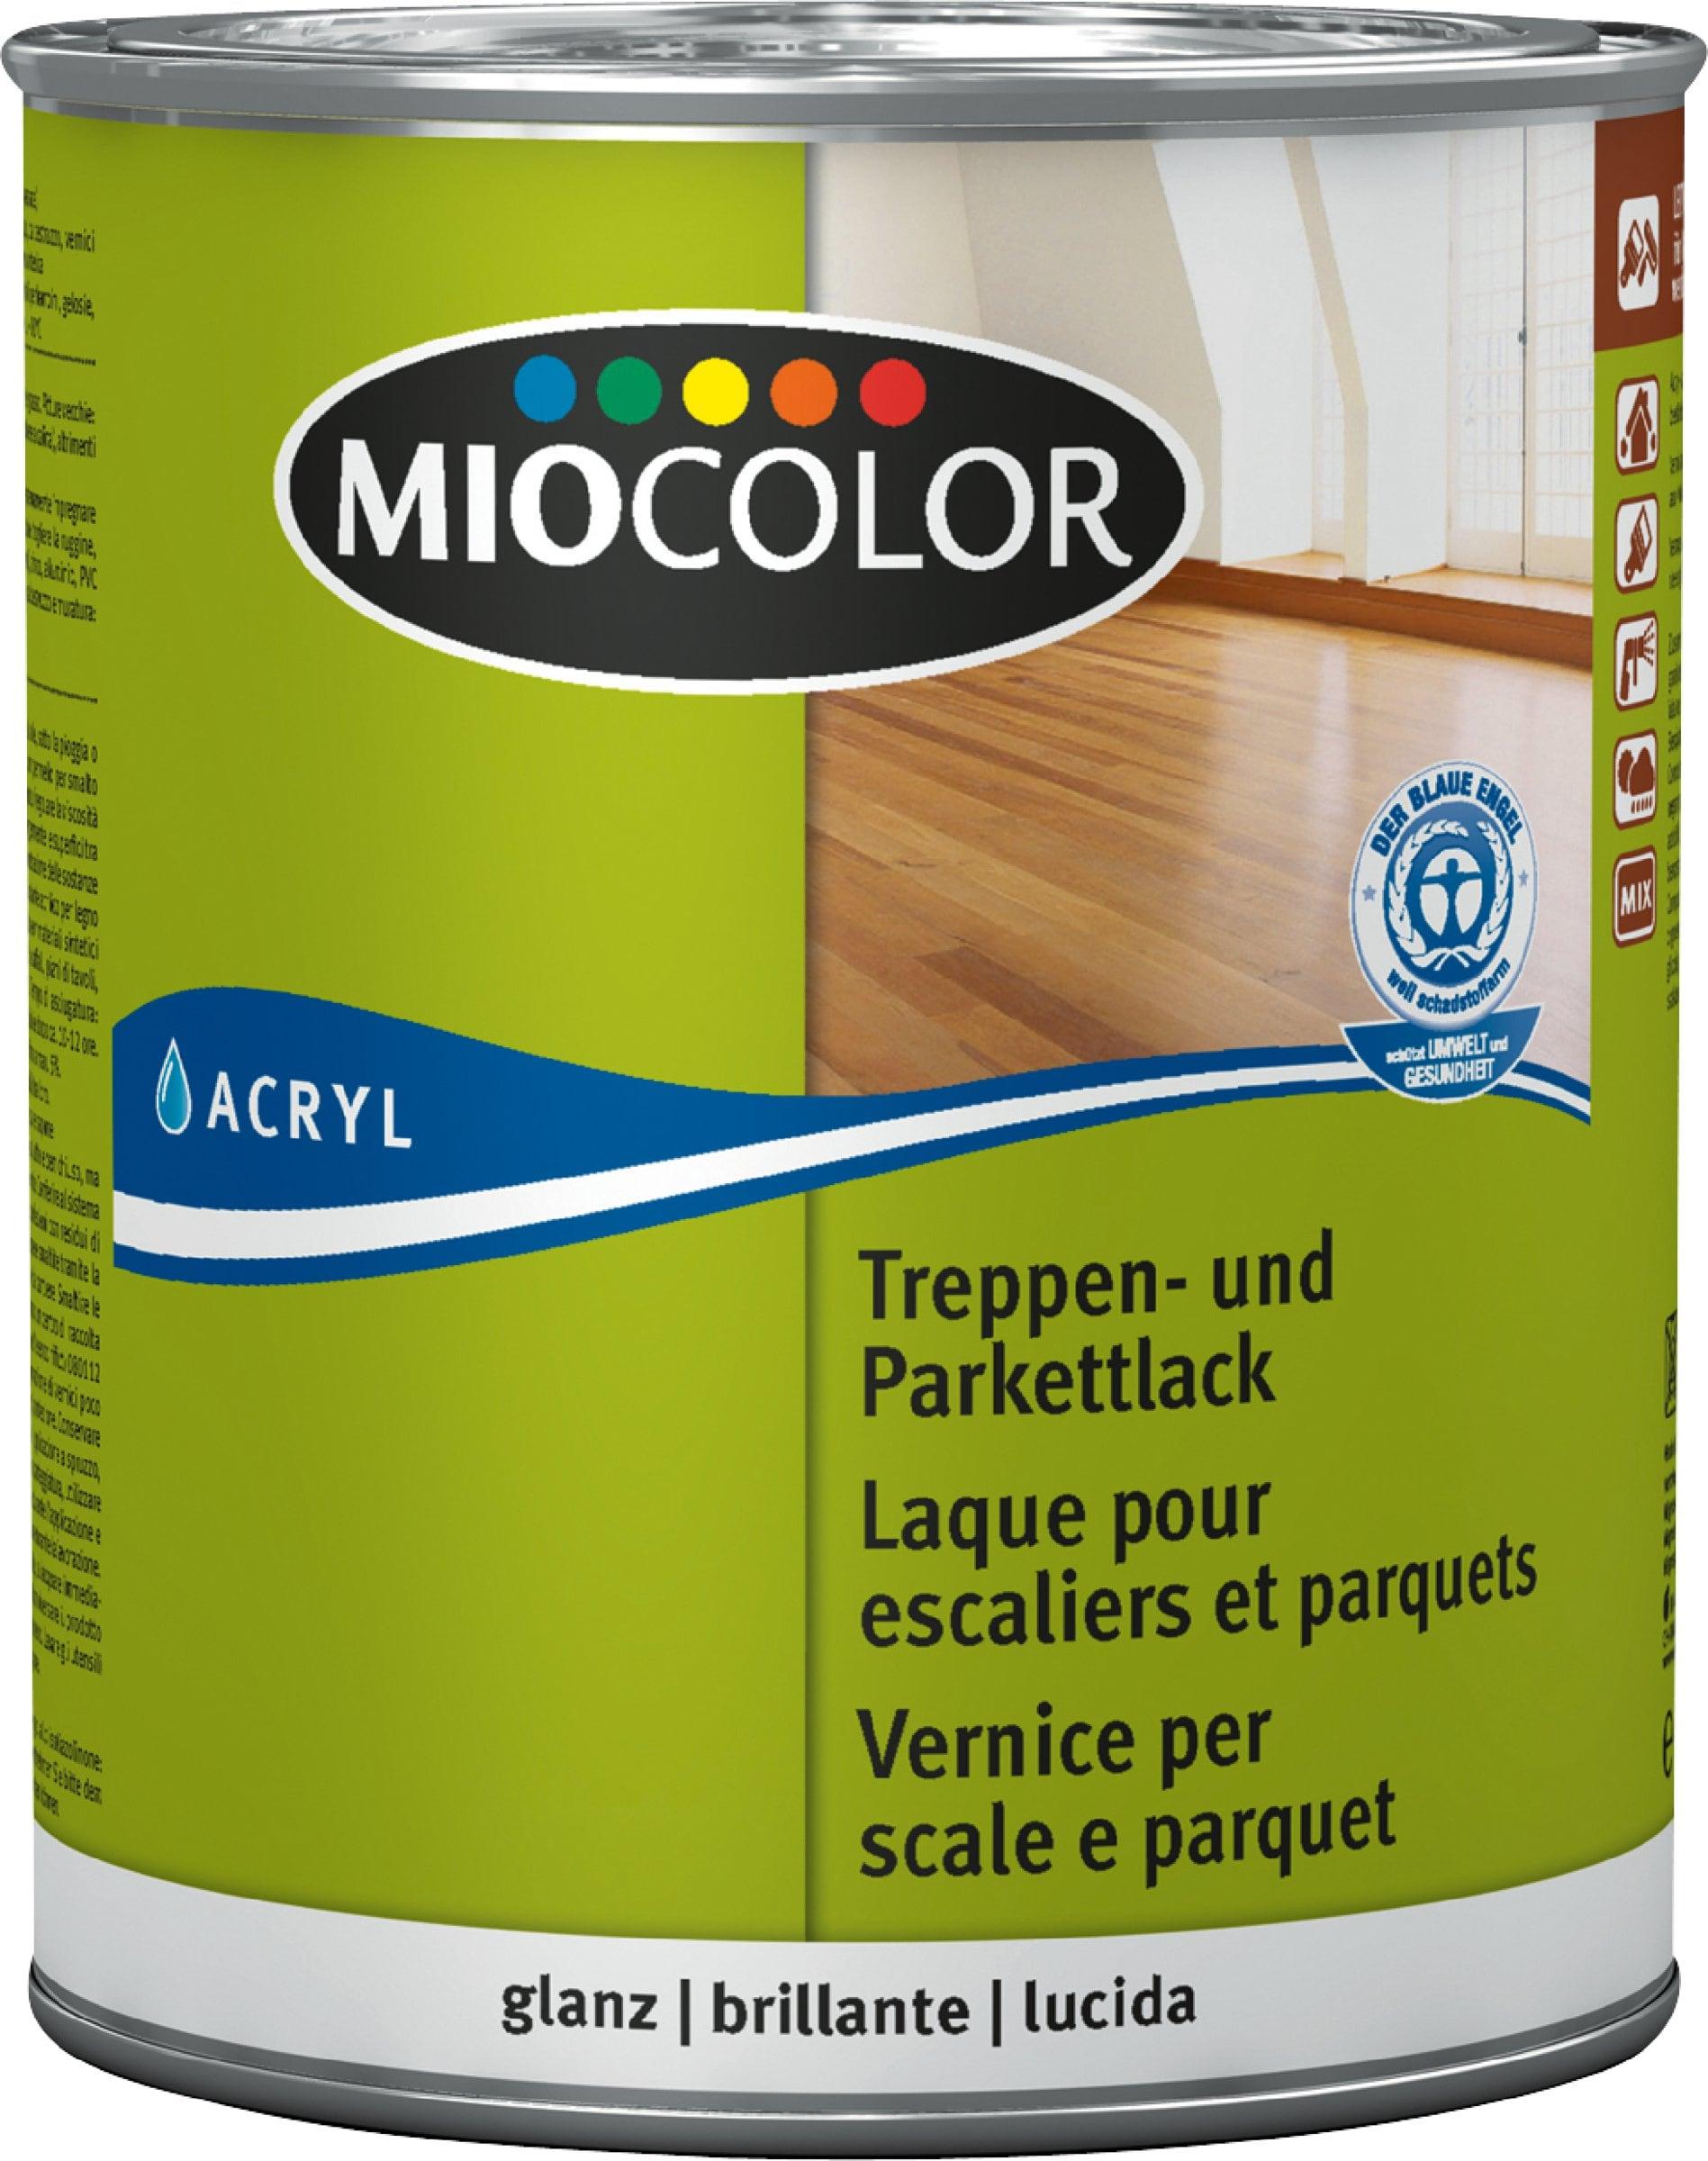 Miocolor Treppen- und Parkettlack glanz Farblos 750 ml